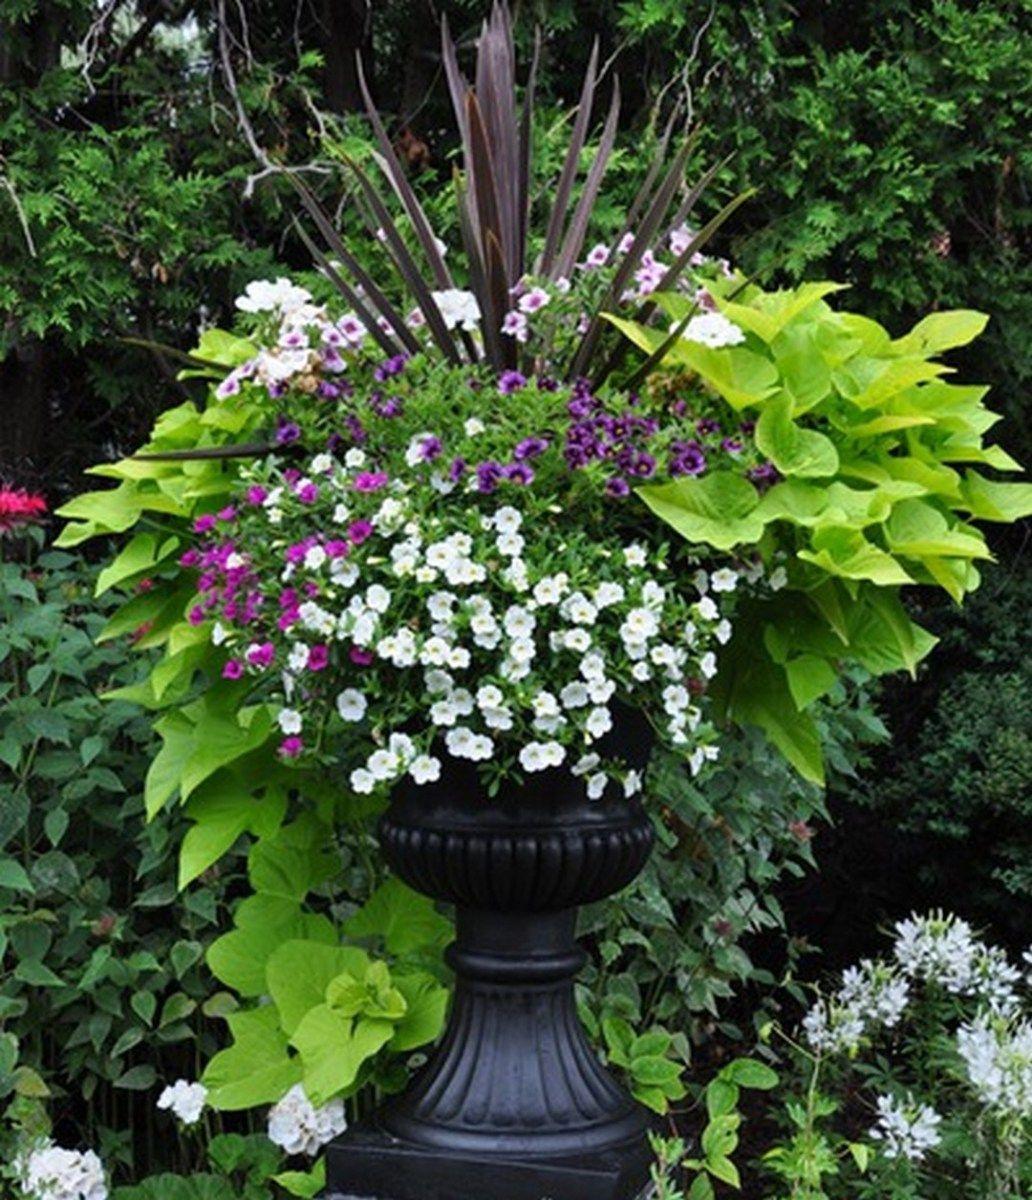 Potted Flowers For Summer Garden Design Ideas